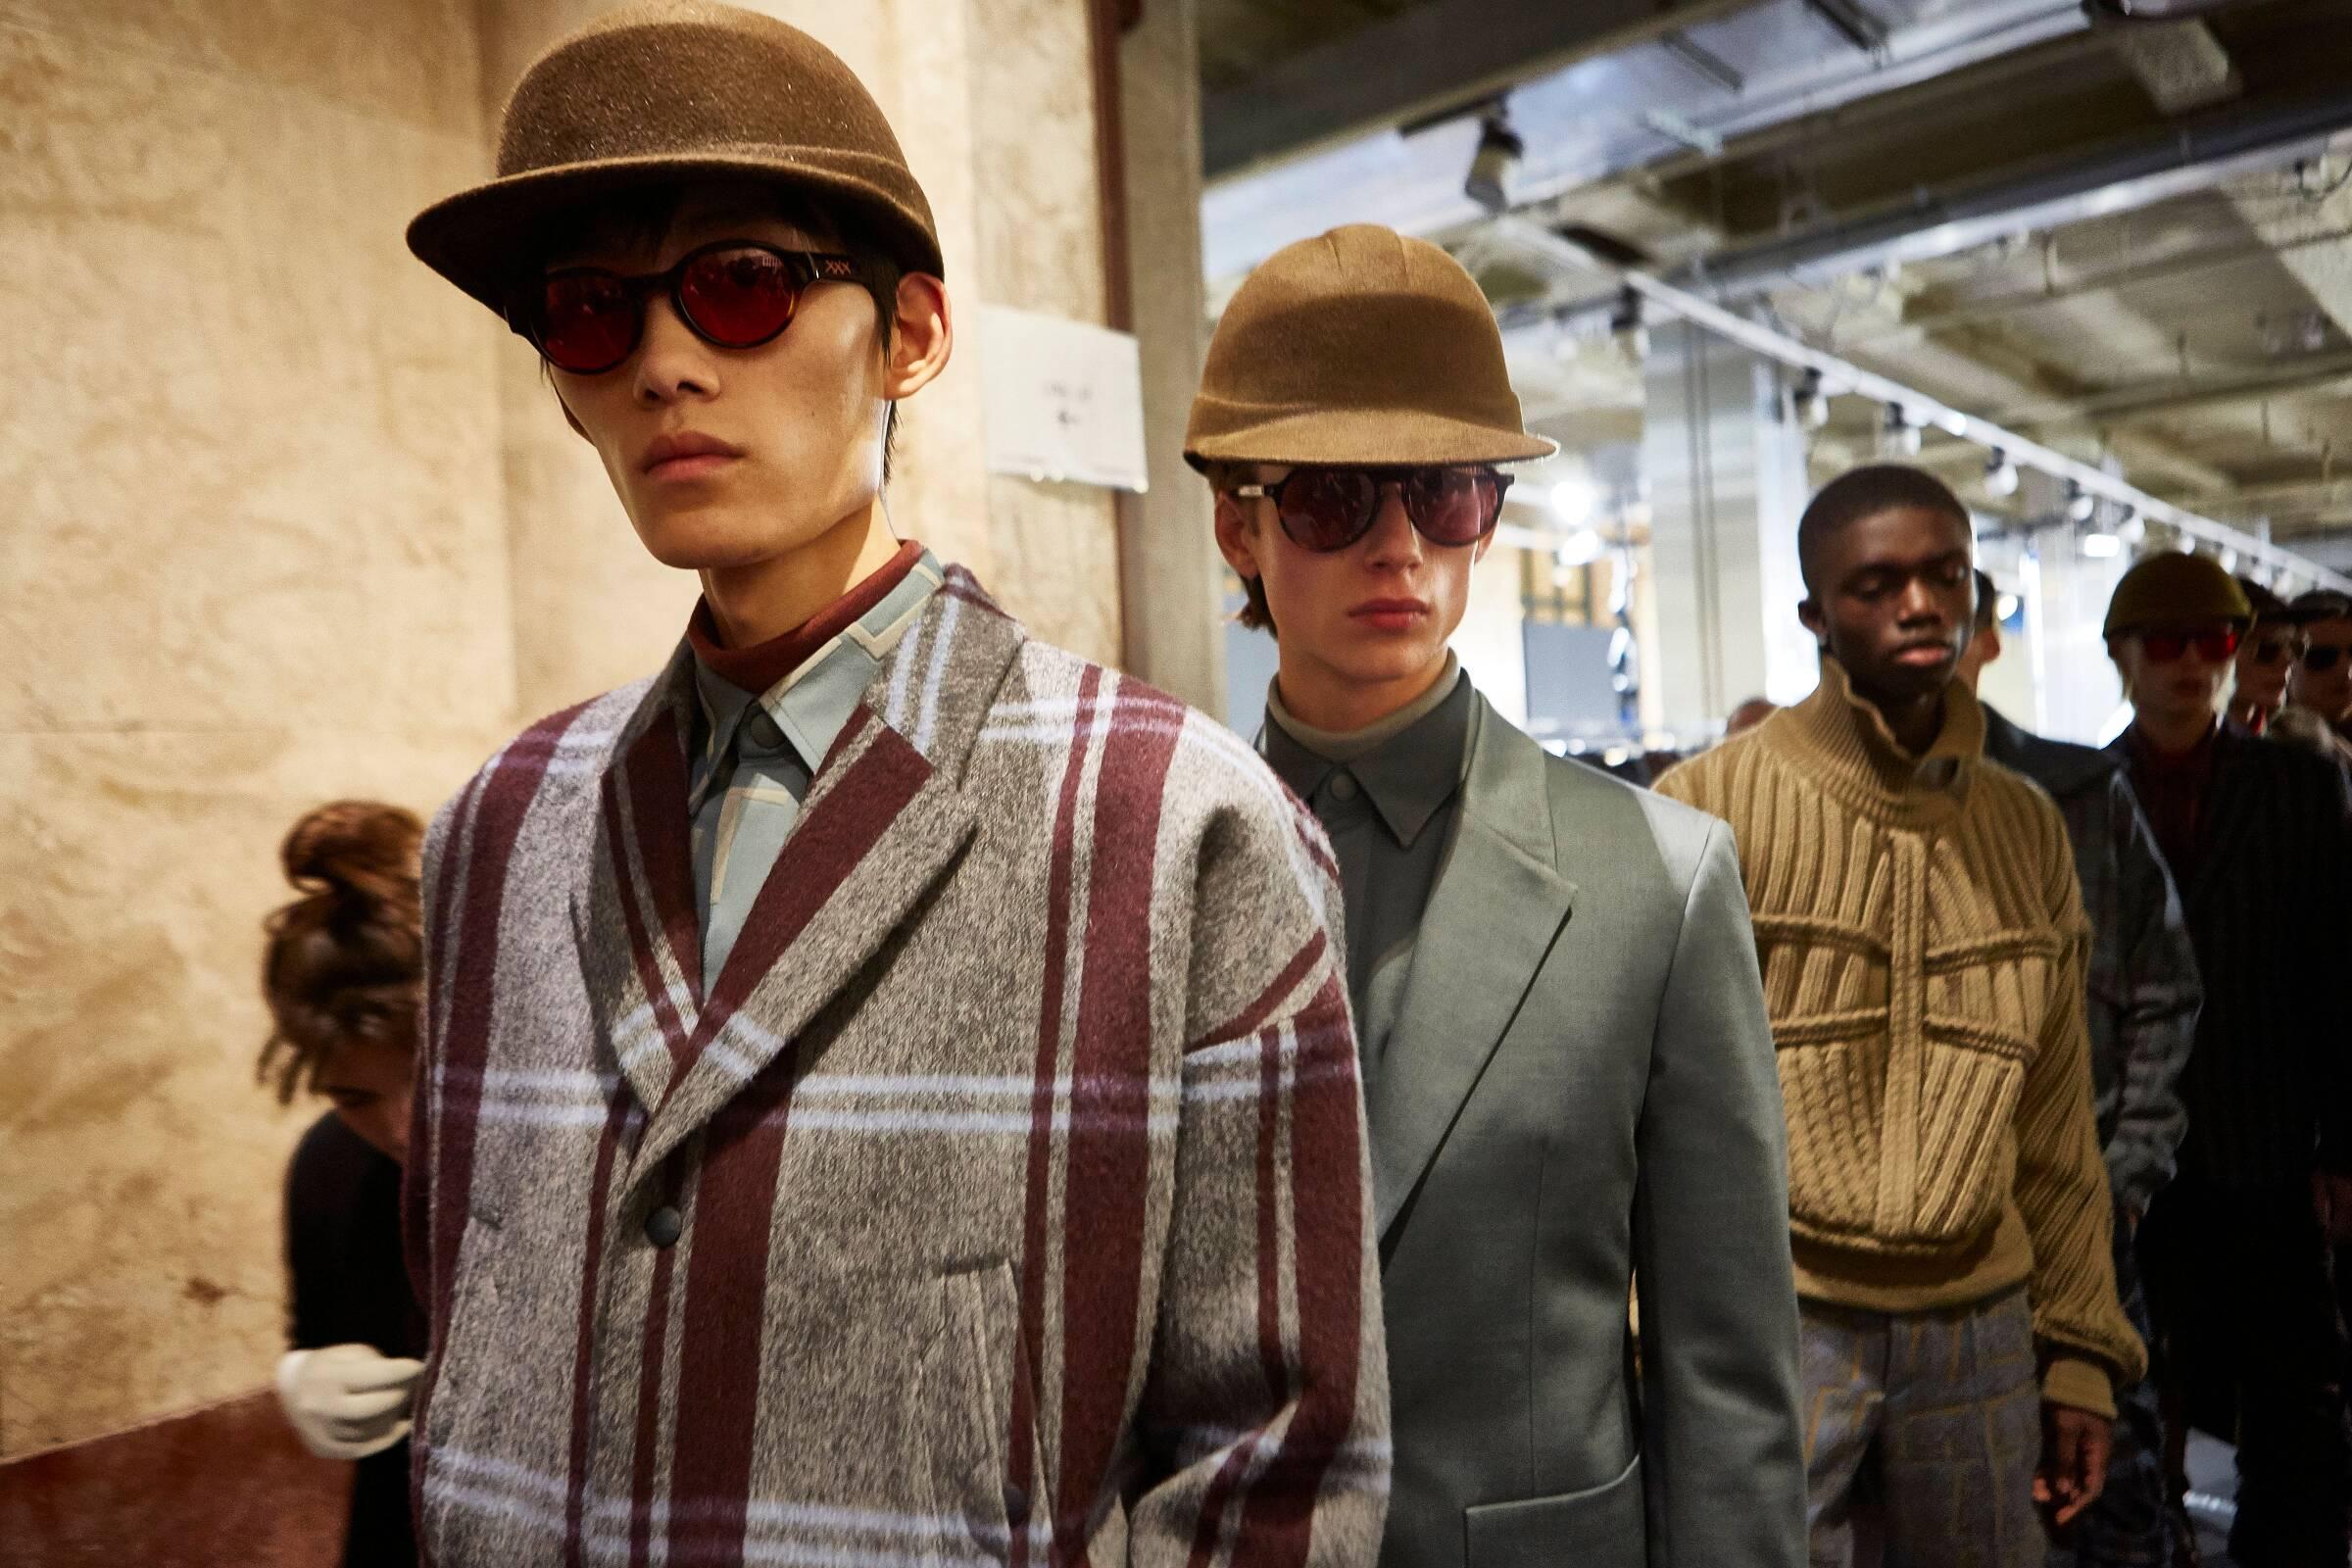 Backstage Ermenegildo Zegna Models Menswear 2019